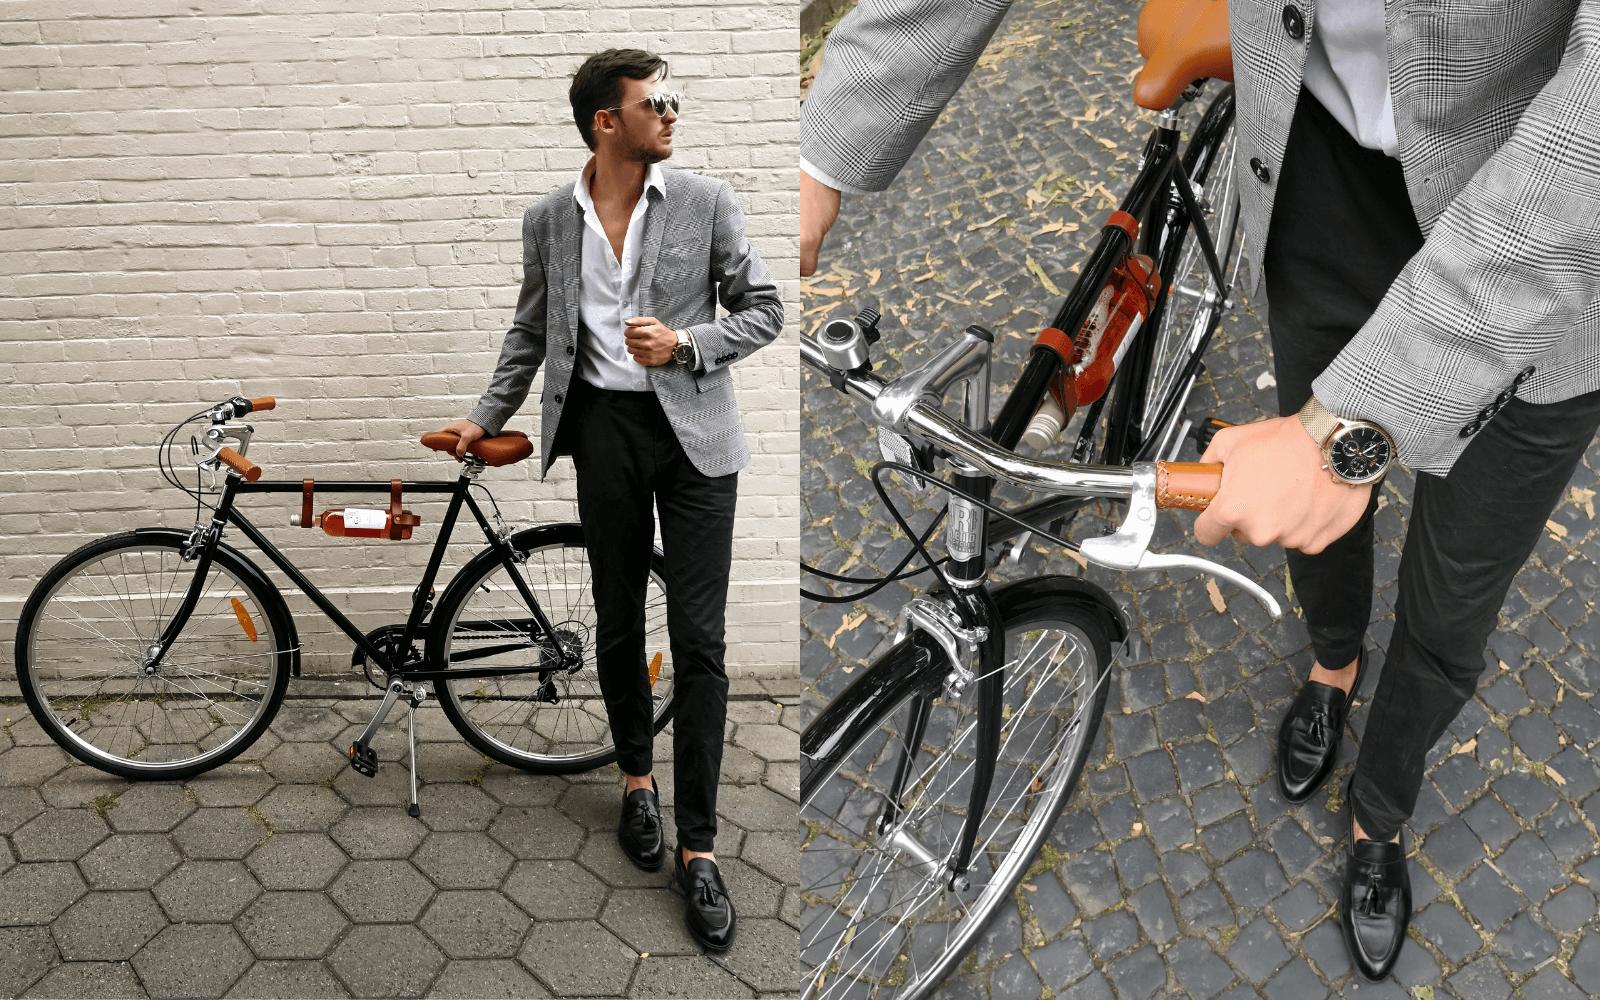 Lifestyle Images Vintage 11 1 - Reid ® - Gents Roadster Bike